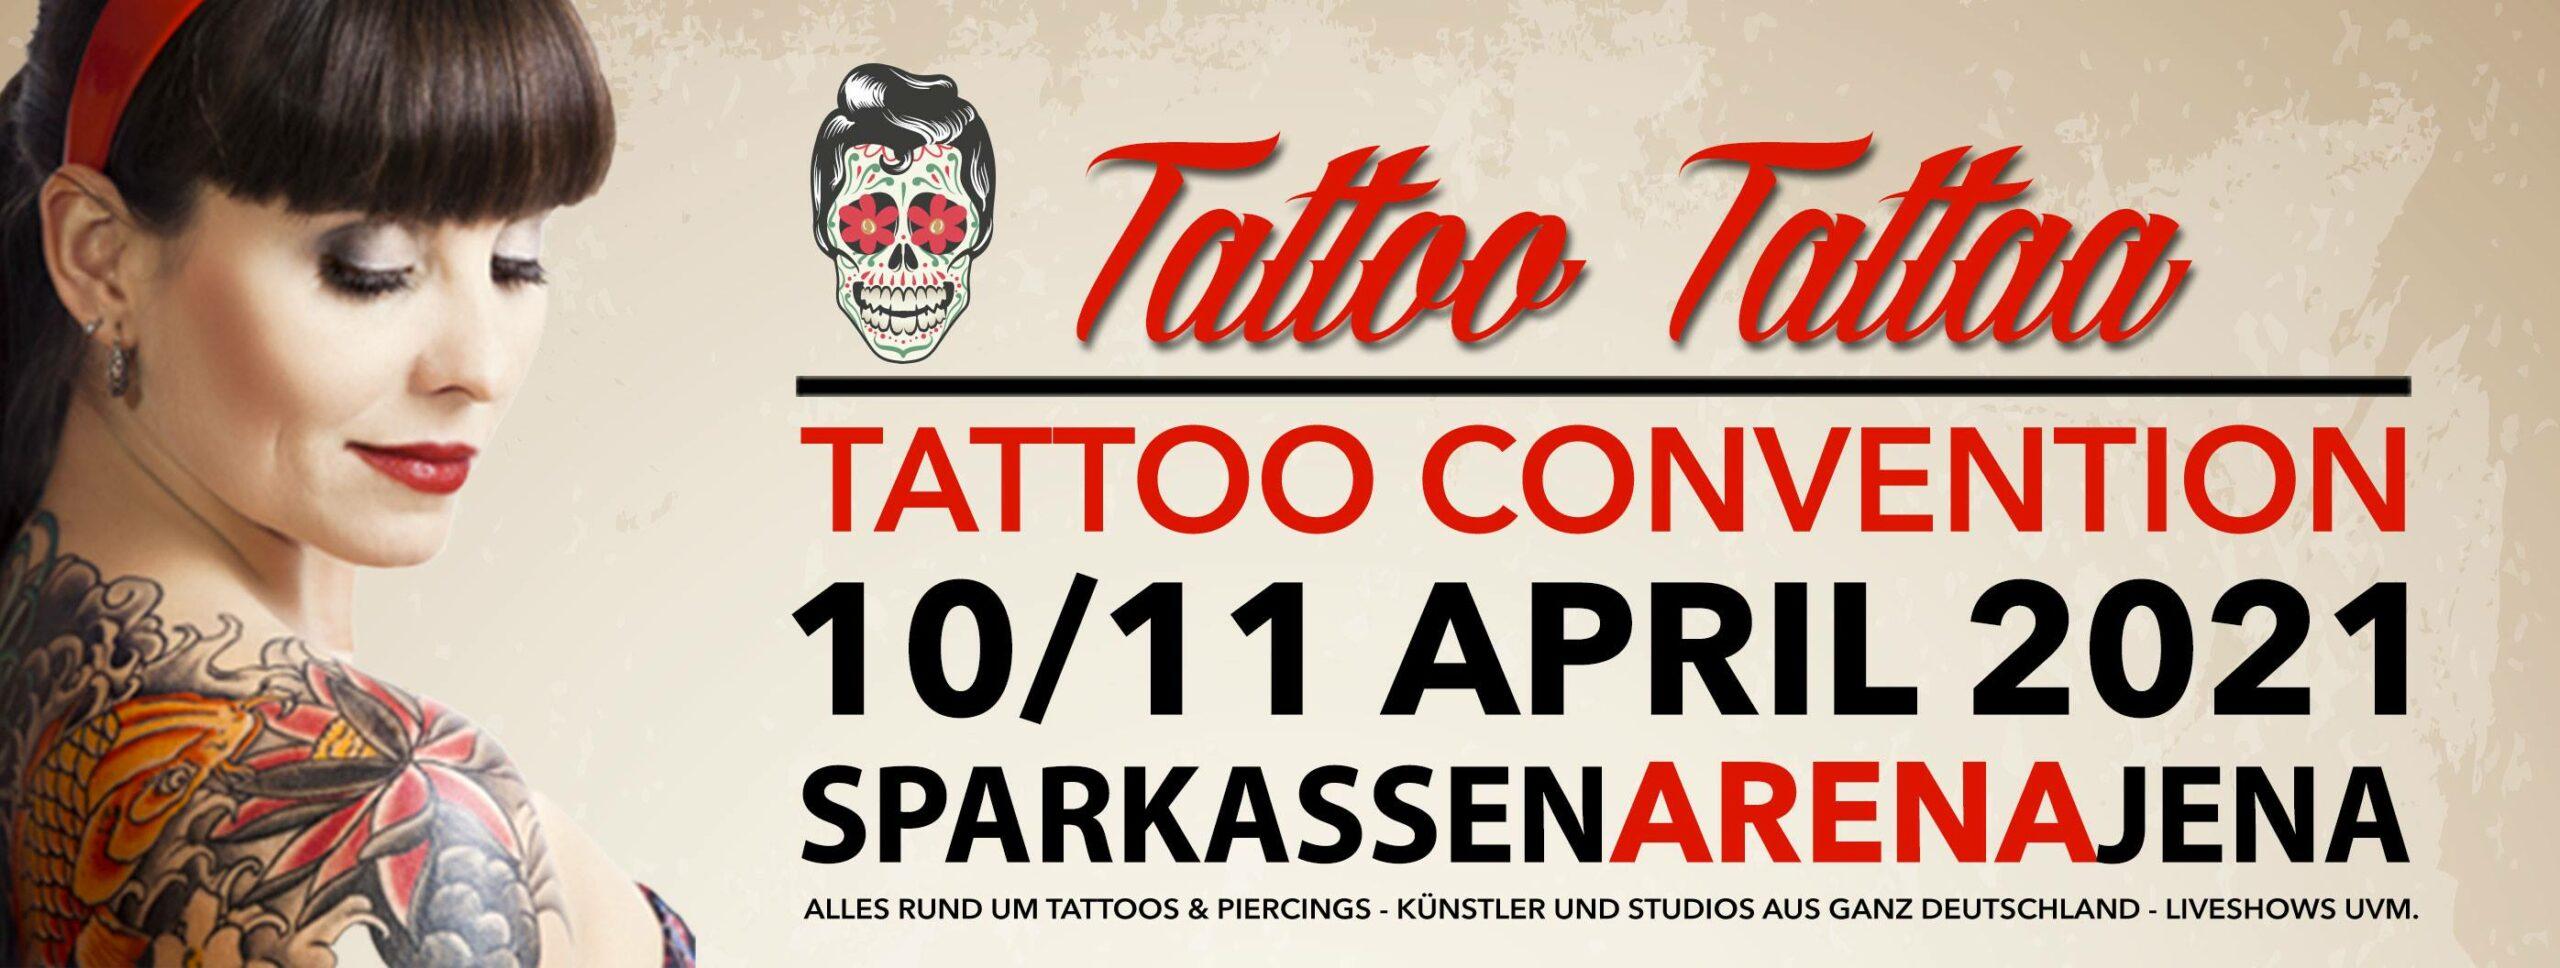 "Tattoo Convention Jena ""TattooTattaa"""